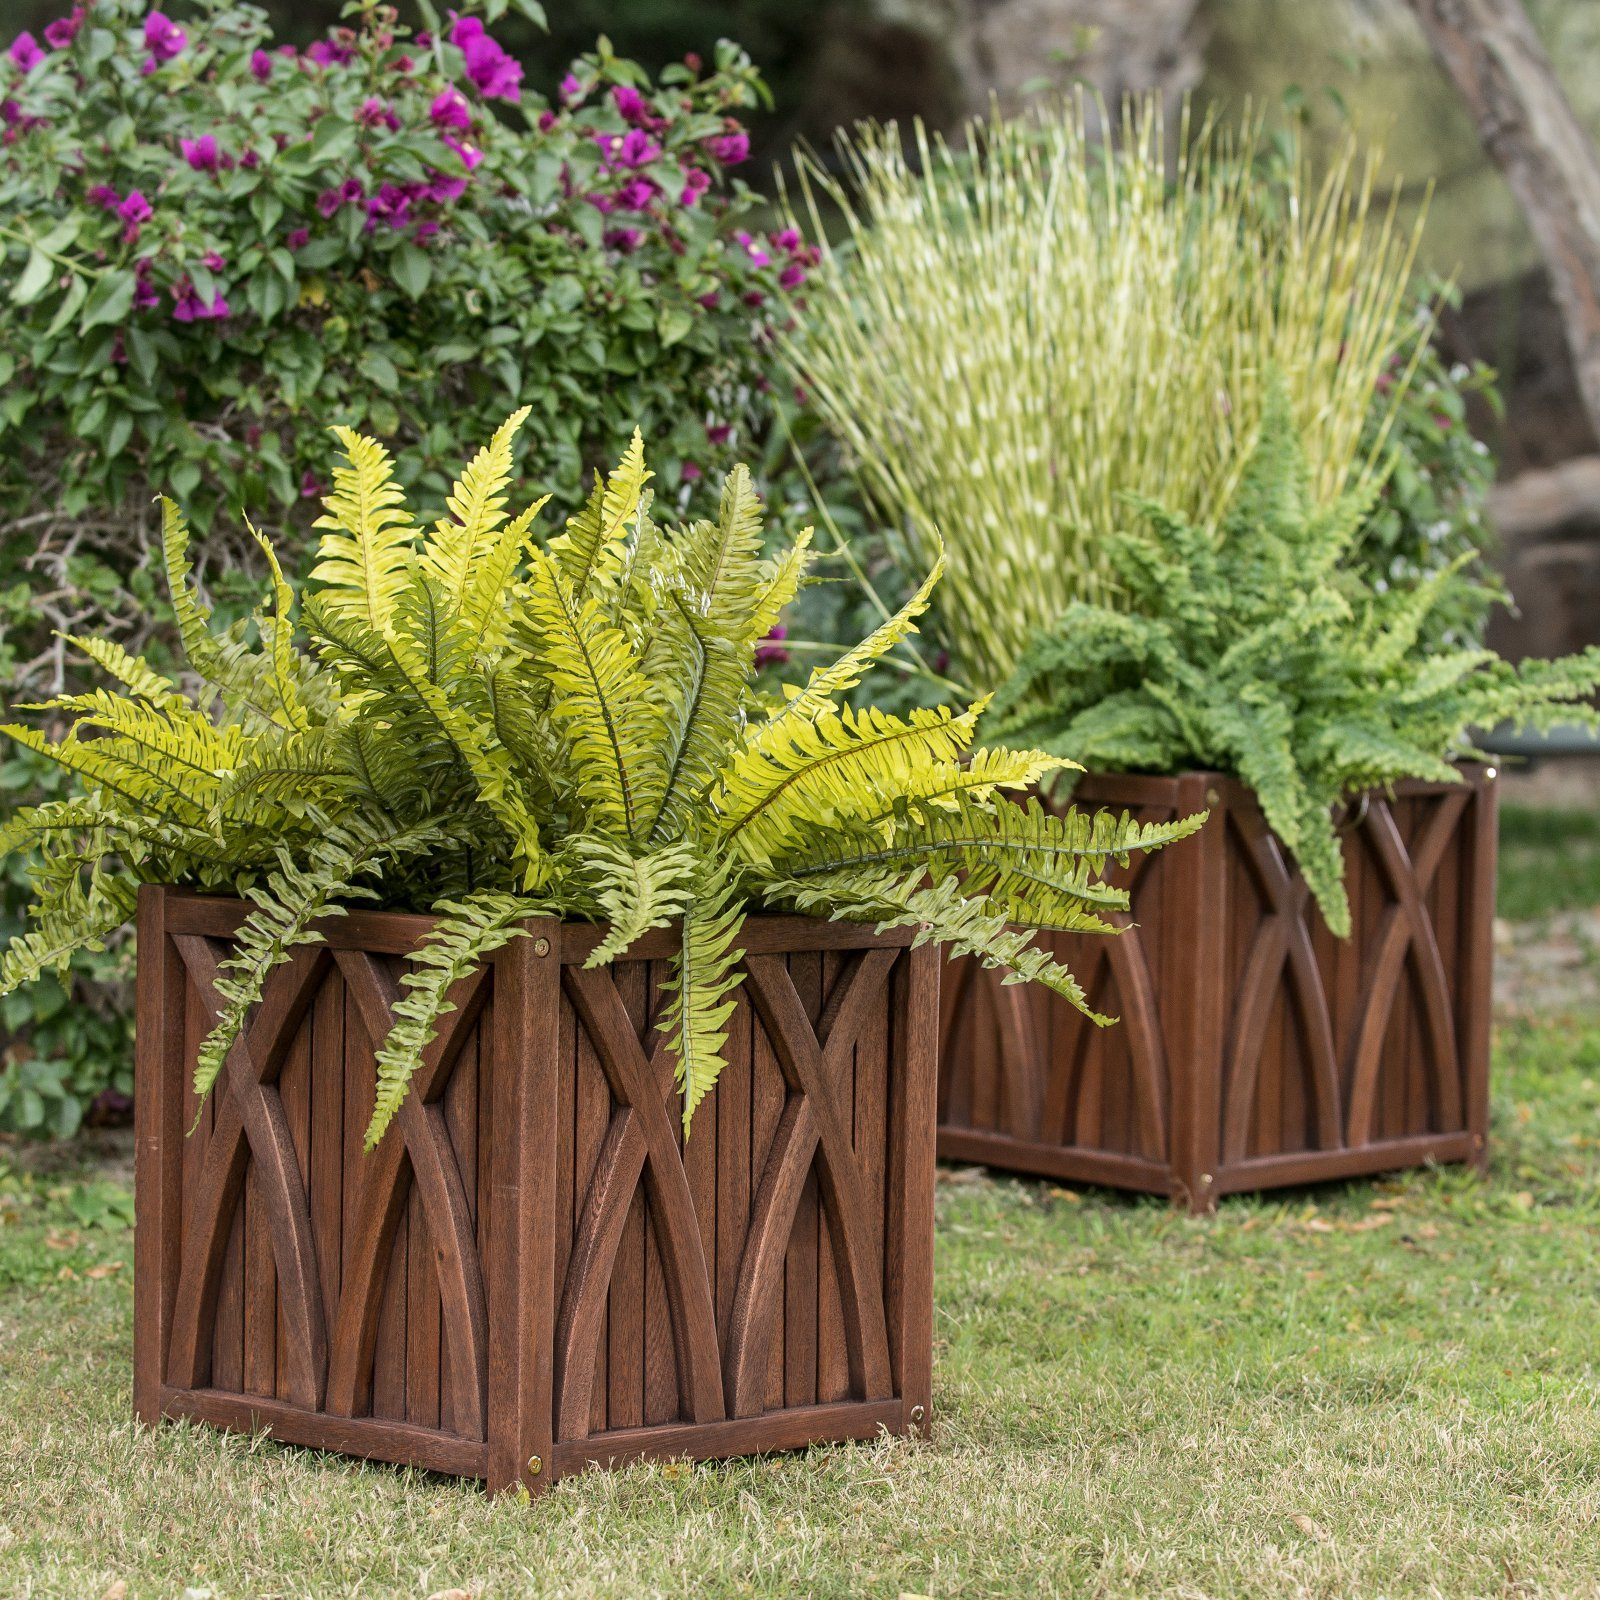 Set of 2 Brown Finish Eucalyptus Wood Patio Pots Planters Outdoor Gardening Planting 15x15